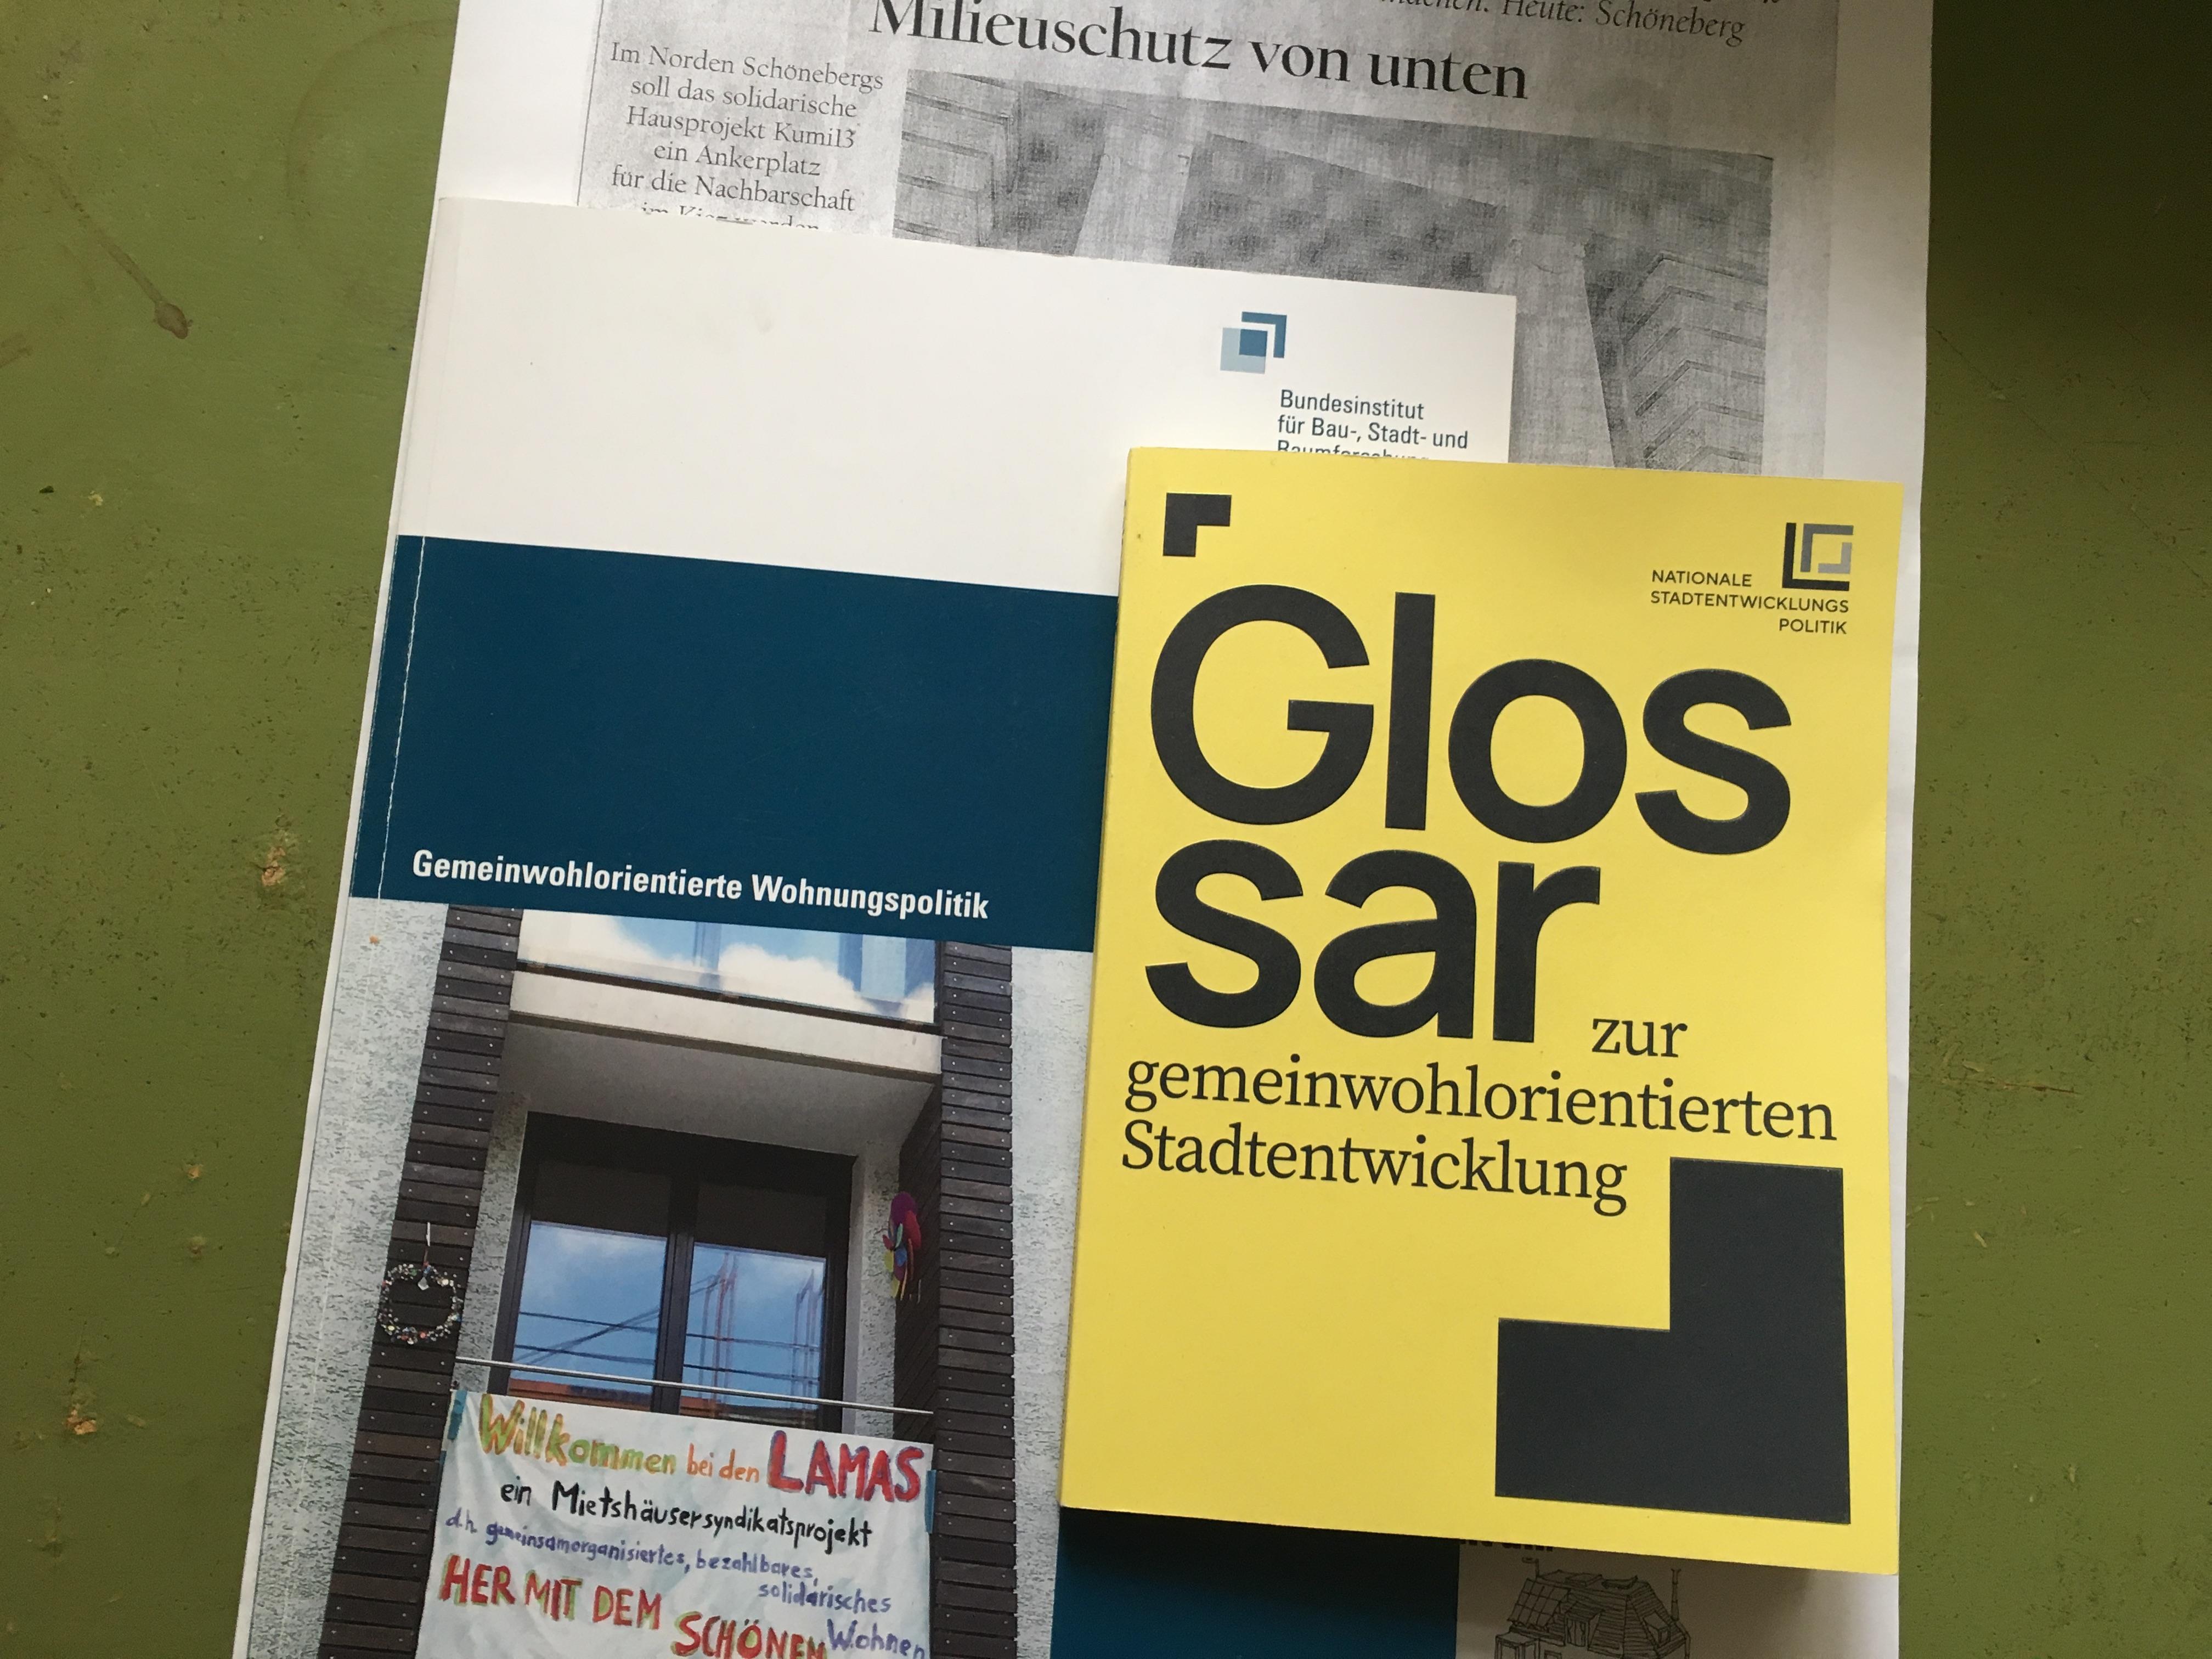 BBSR-Broschüren erklären das Mietshäuser Syndikat